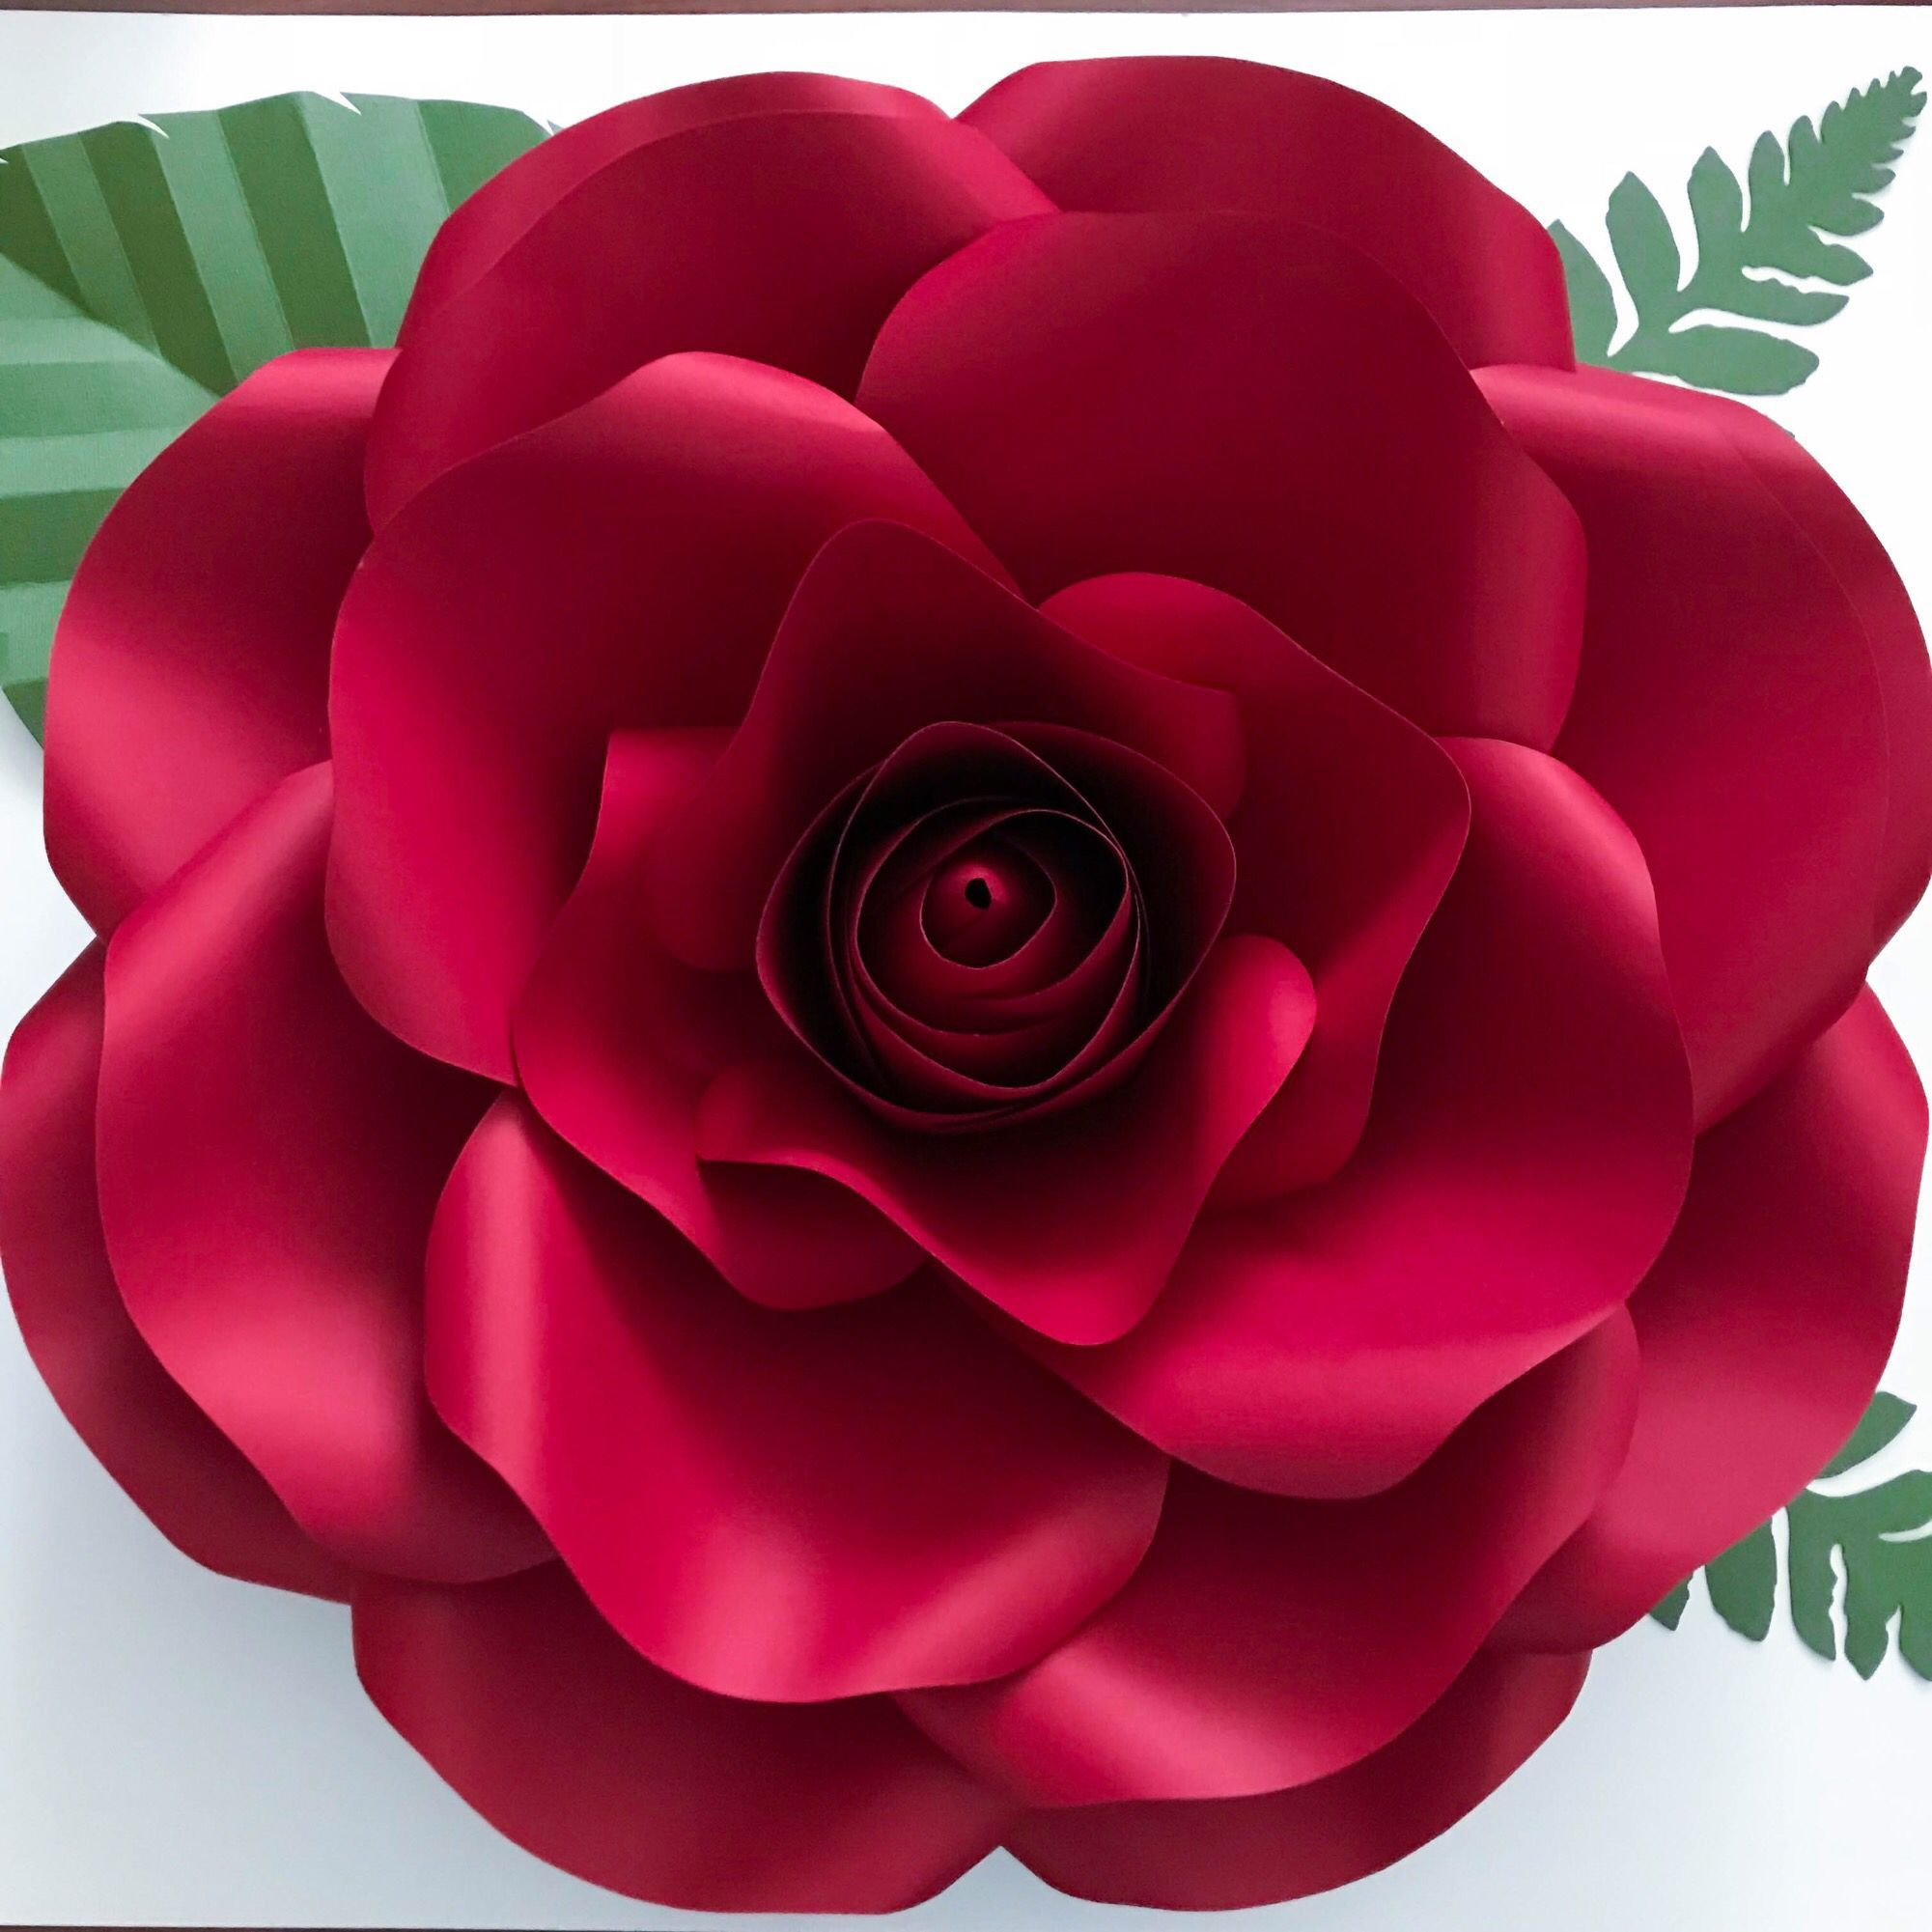 005 Staggering Giant Rose Paper Flower Template Free Sample Full